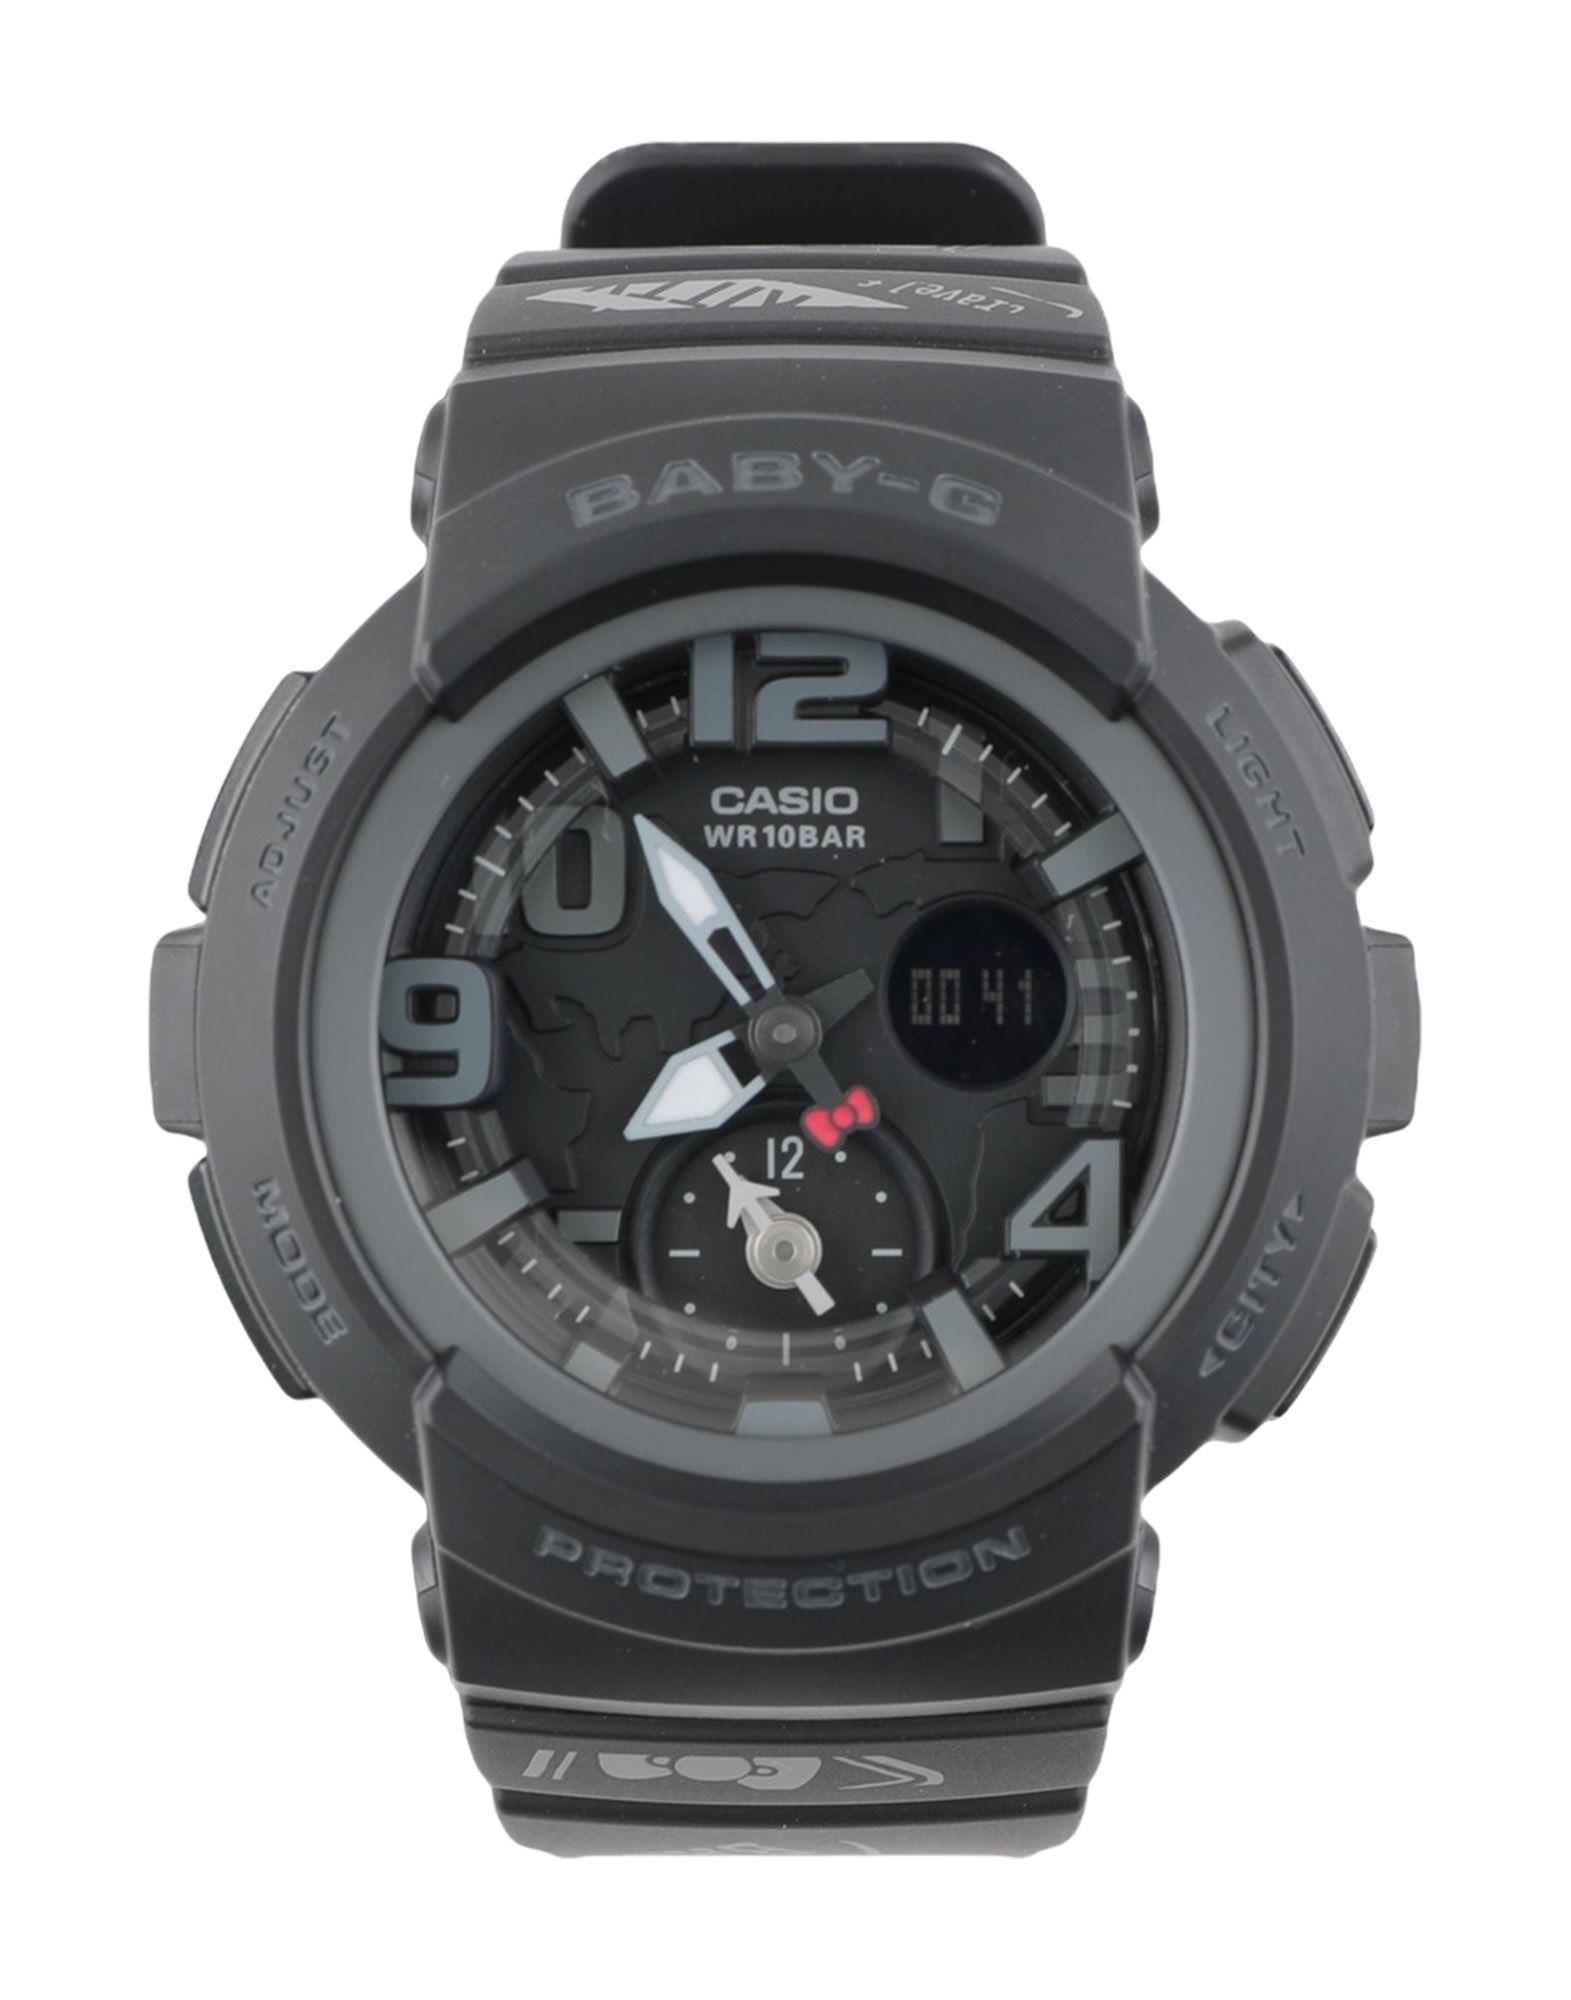 CASIO G-SHOCK Наручные часы наручные часы casio lrw 200h 2e